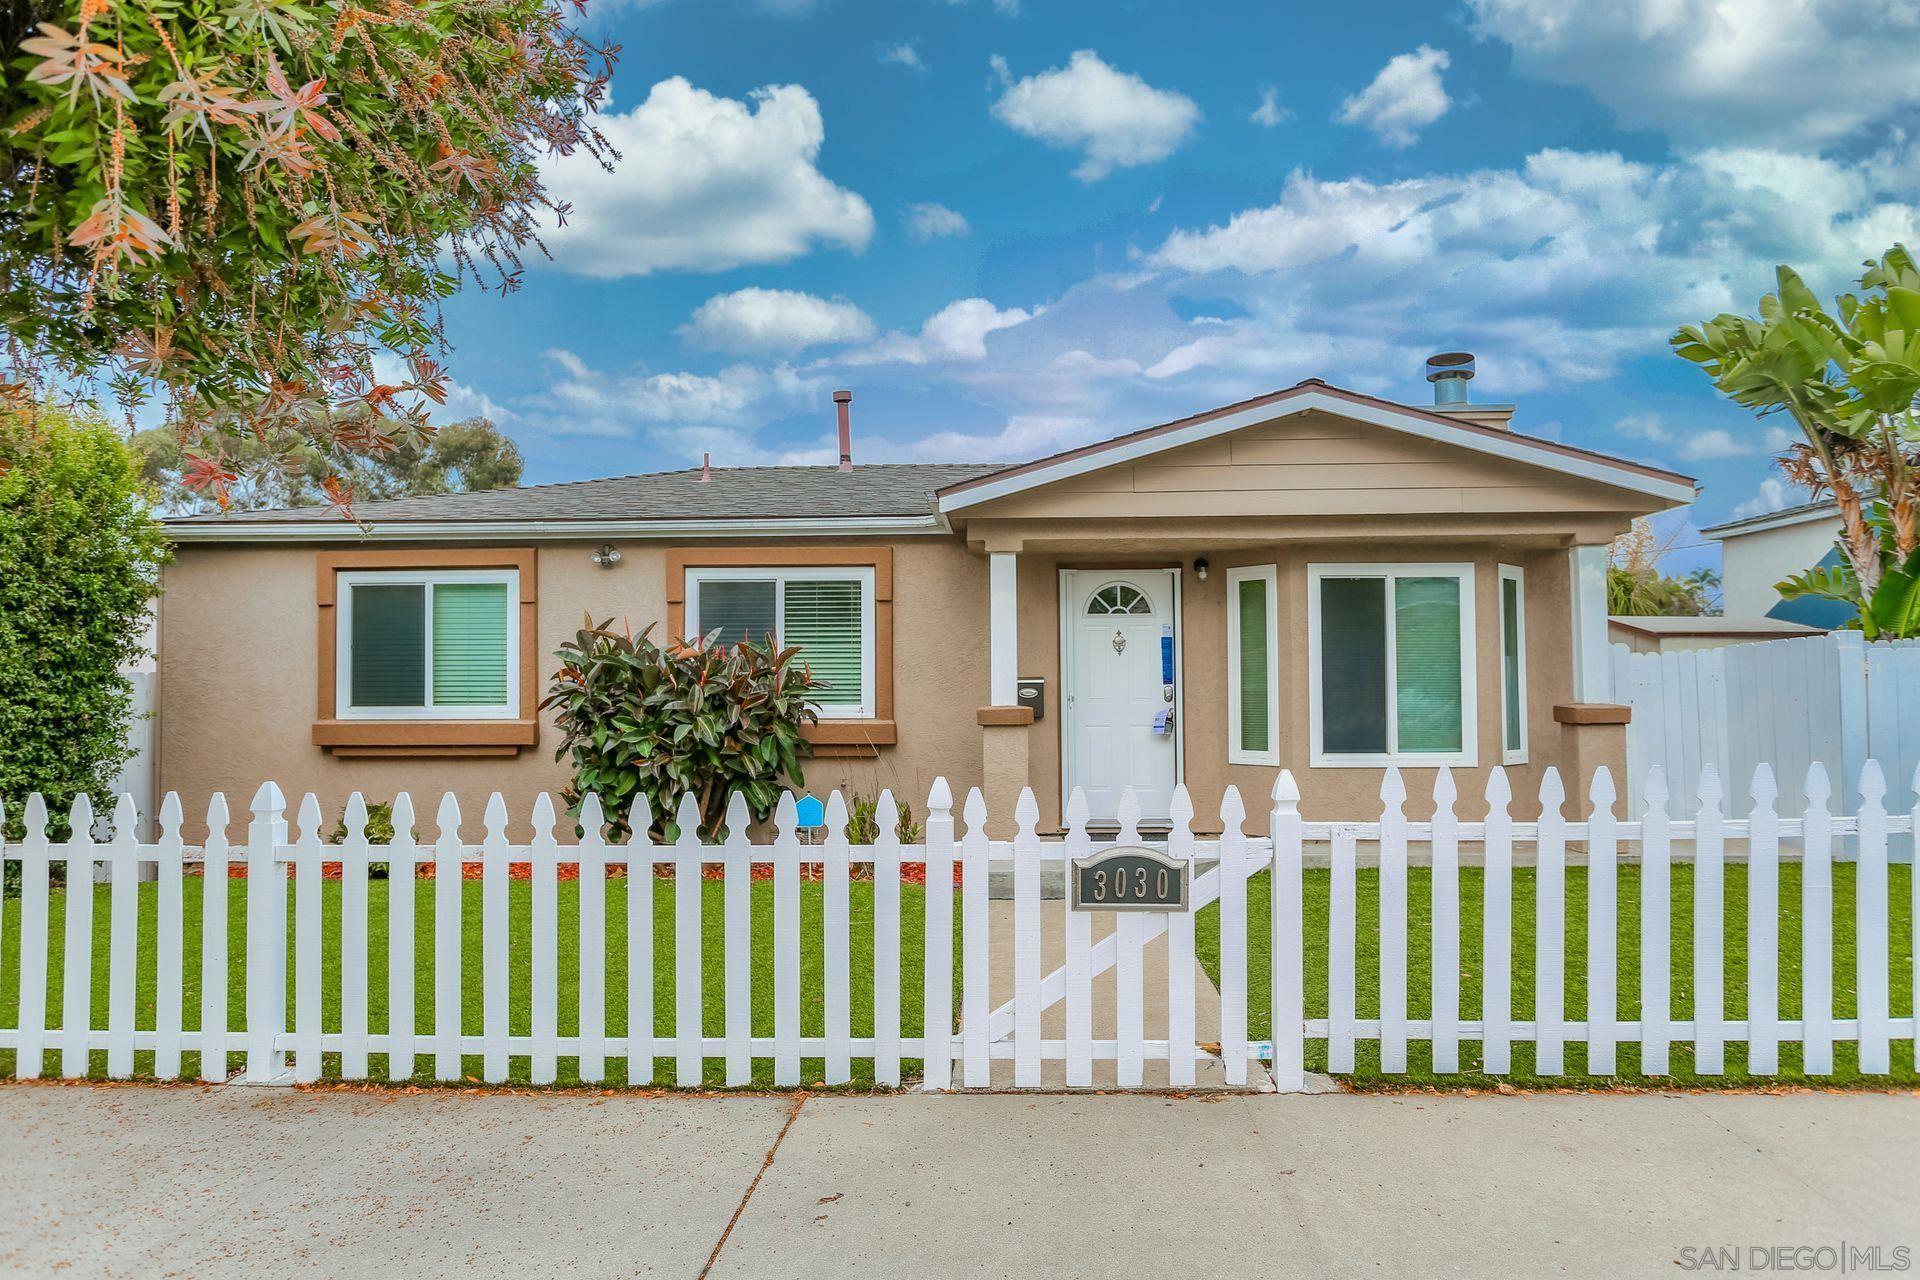 3030 Nile St, San Diego, CA 92104